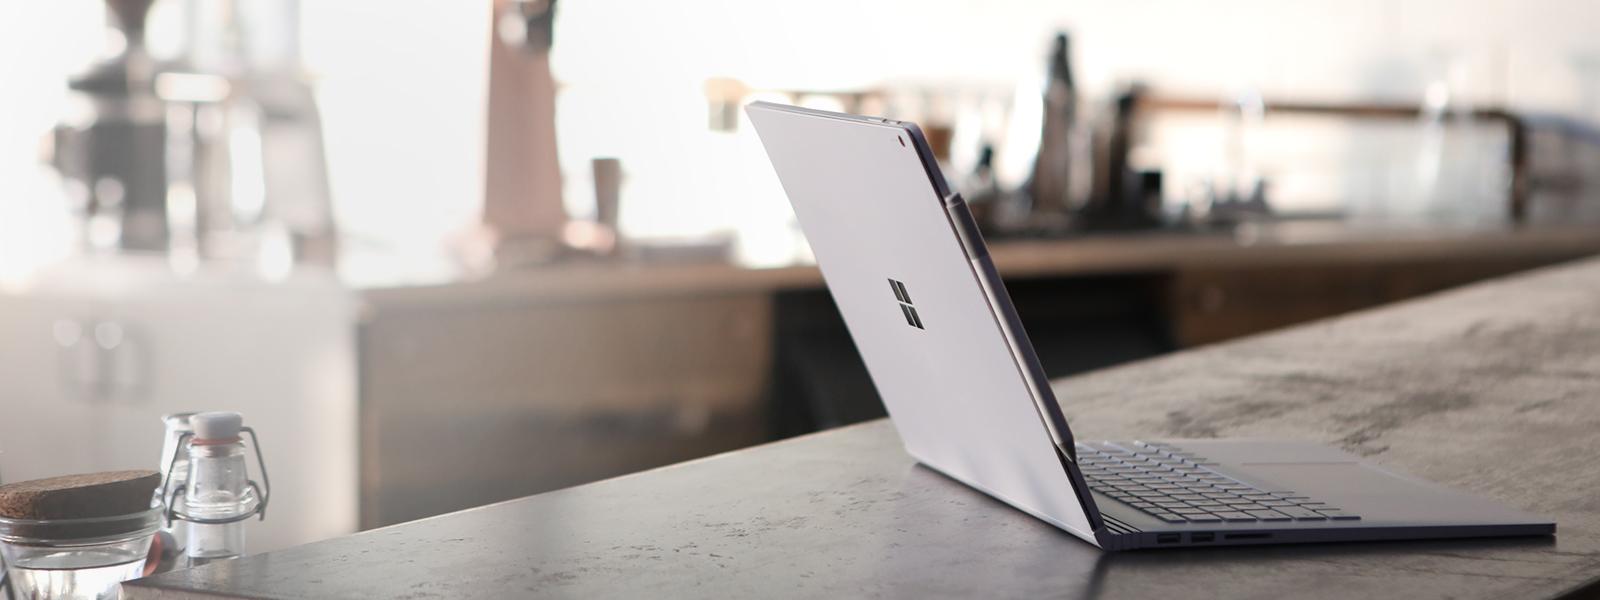 Introducing Surface Book 2